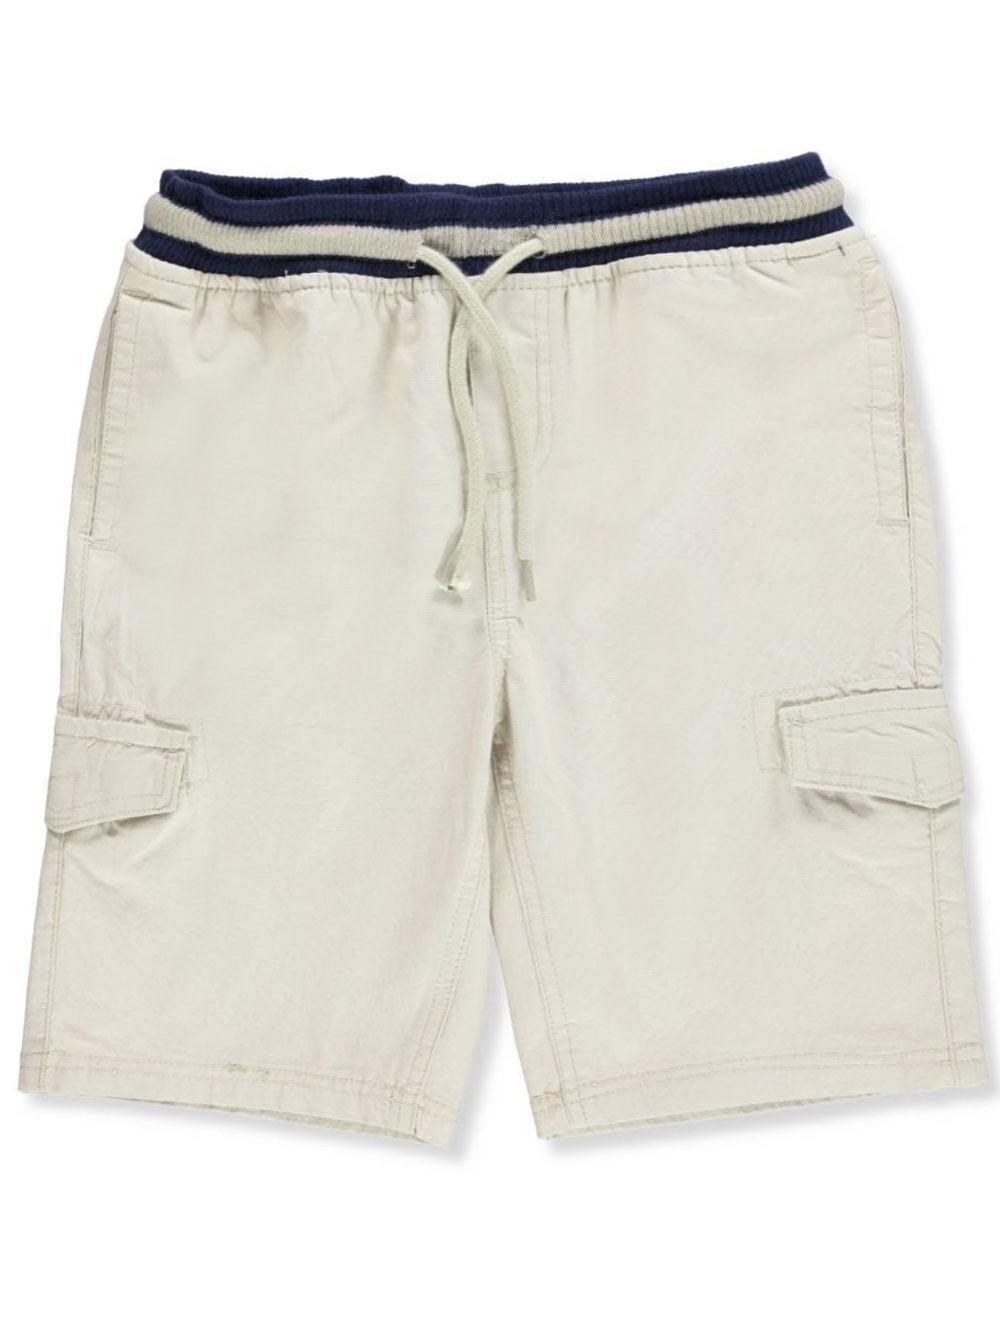 Smiths American Boys Shorts